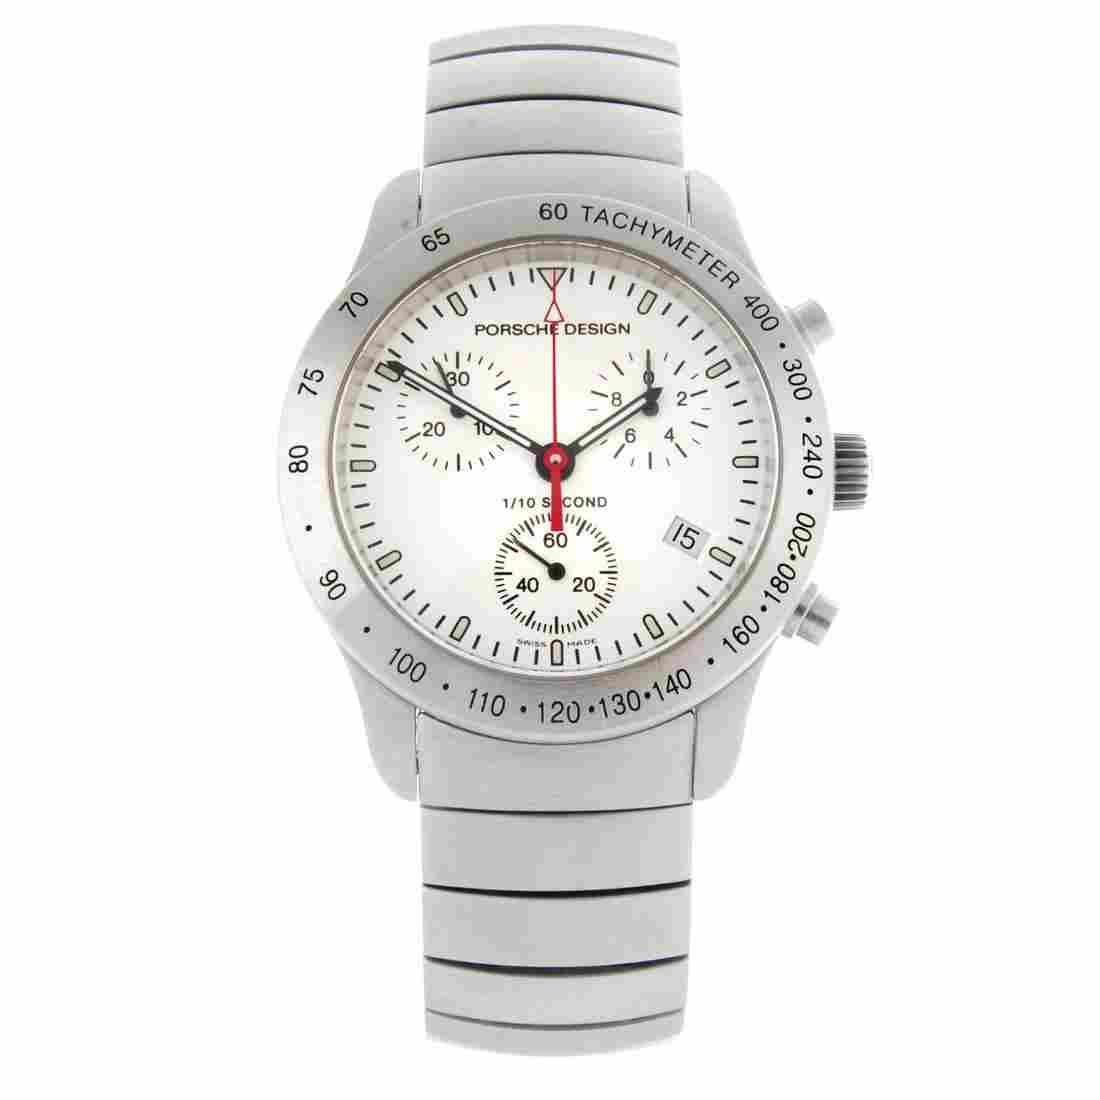 PORSCHE DESIGN - a gentleman's chronograph bracelet